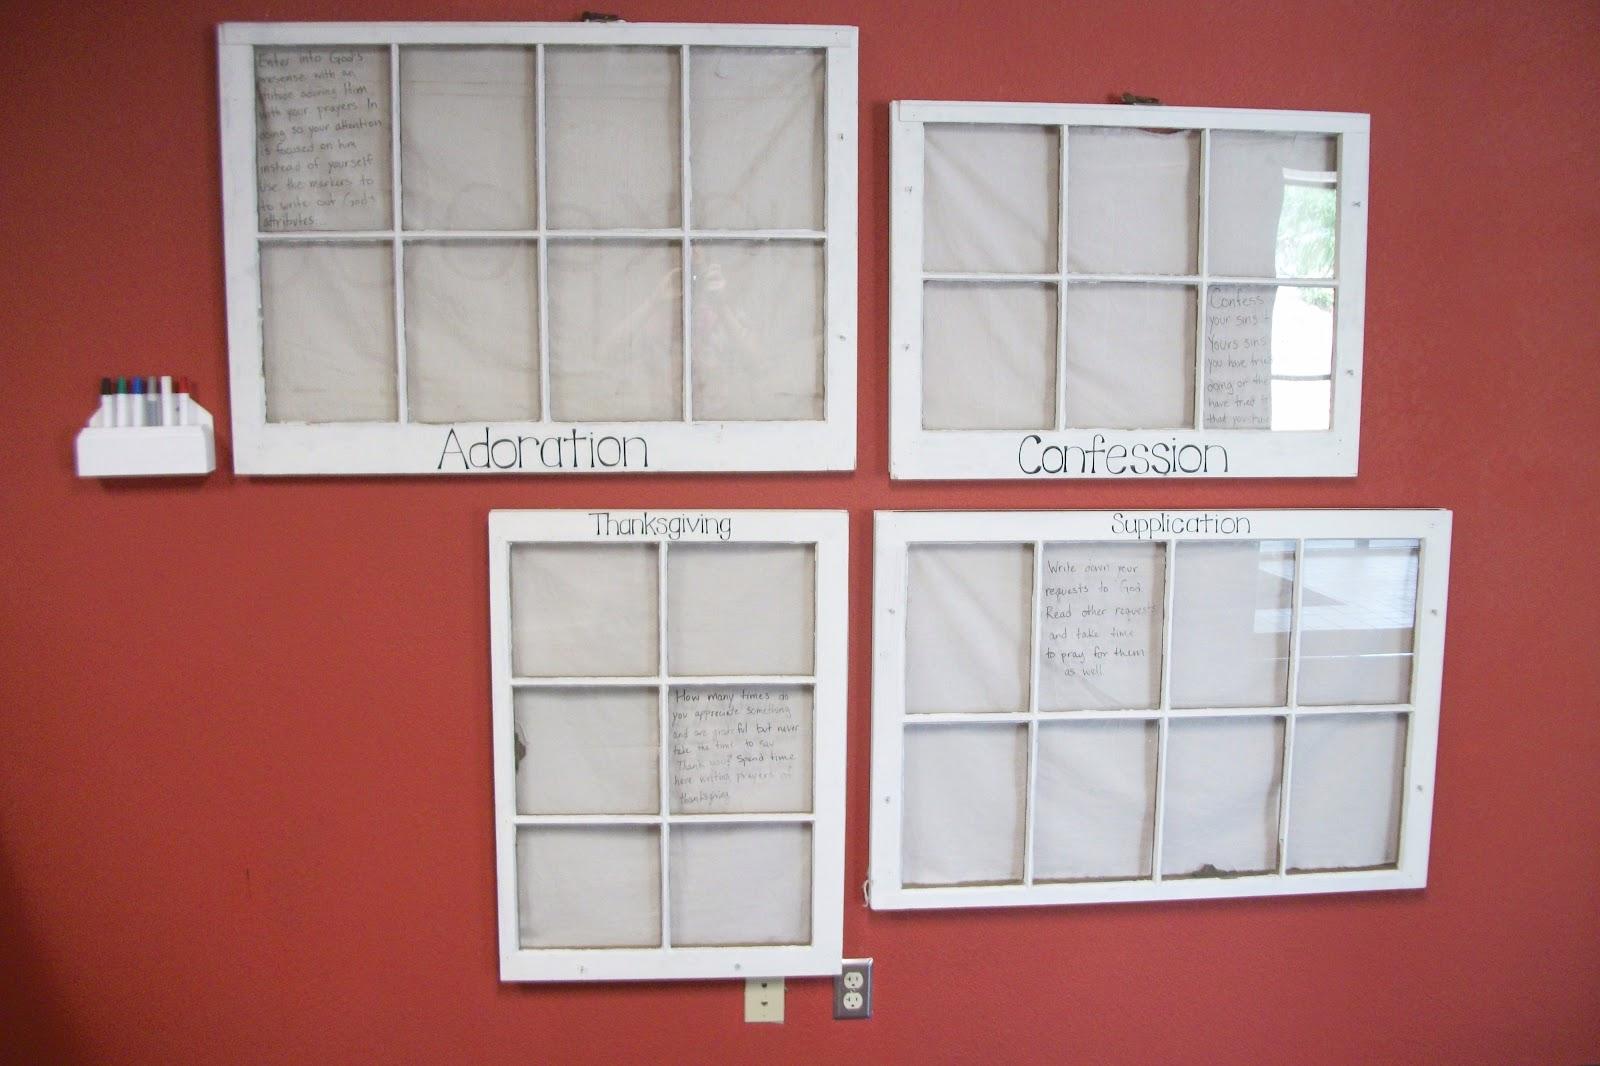 Creatively seeking august 2012 for 10 40 window prayer points